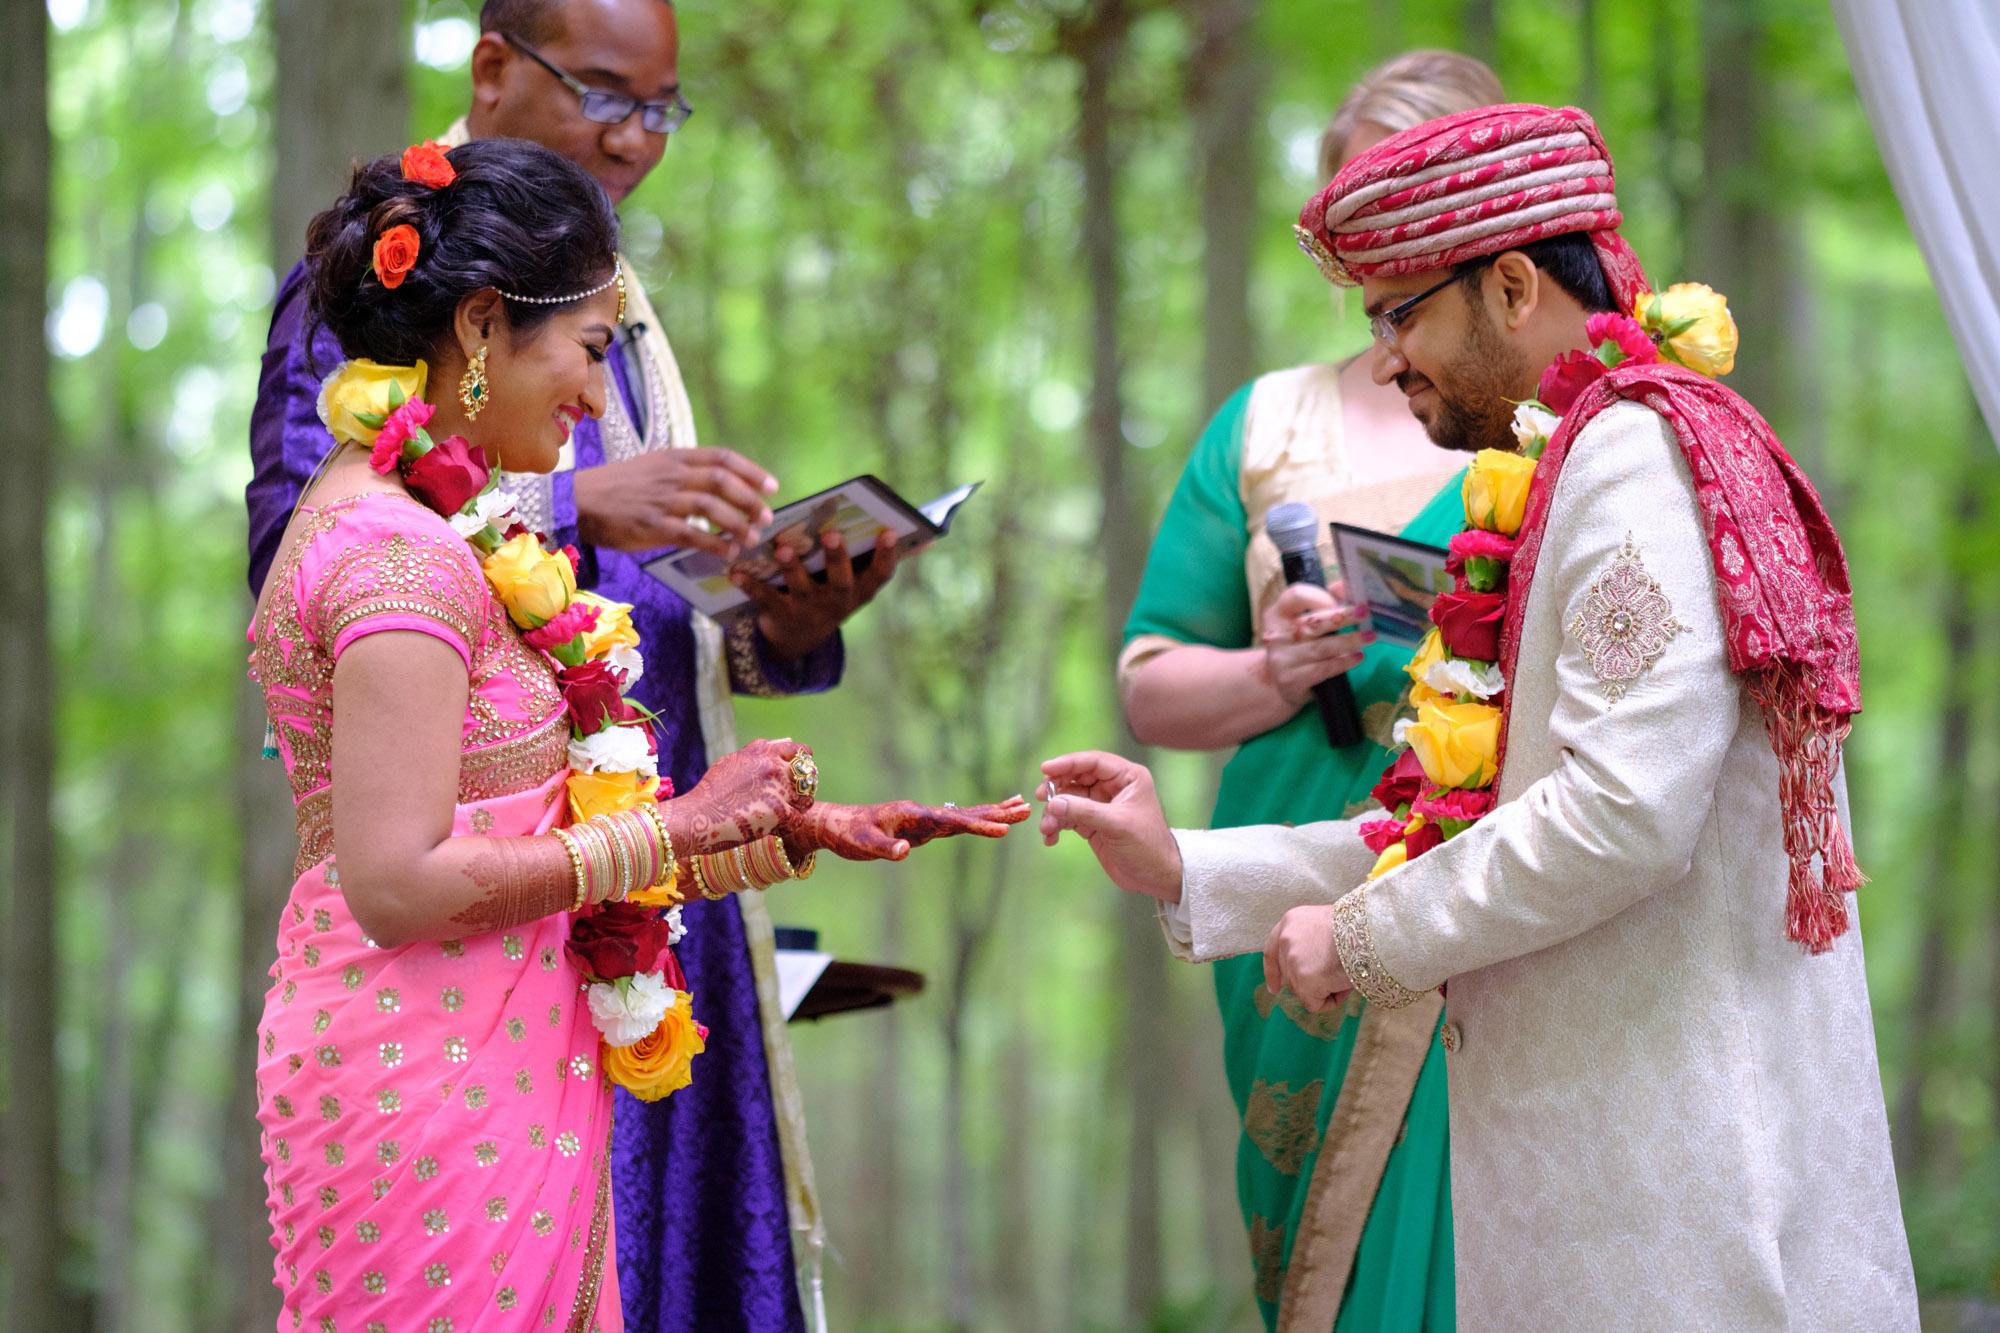 malika & nadir woodsgate stroudsmoor wedding 56